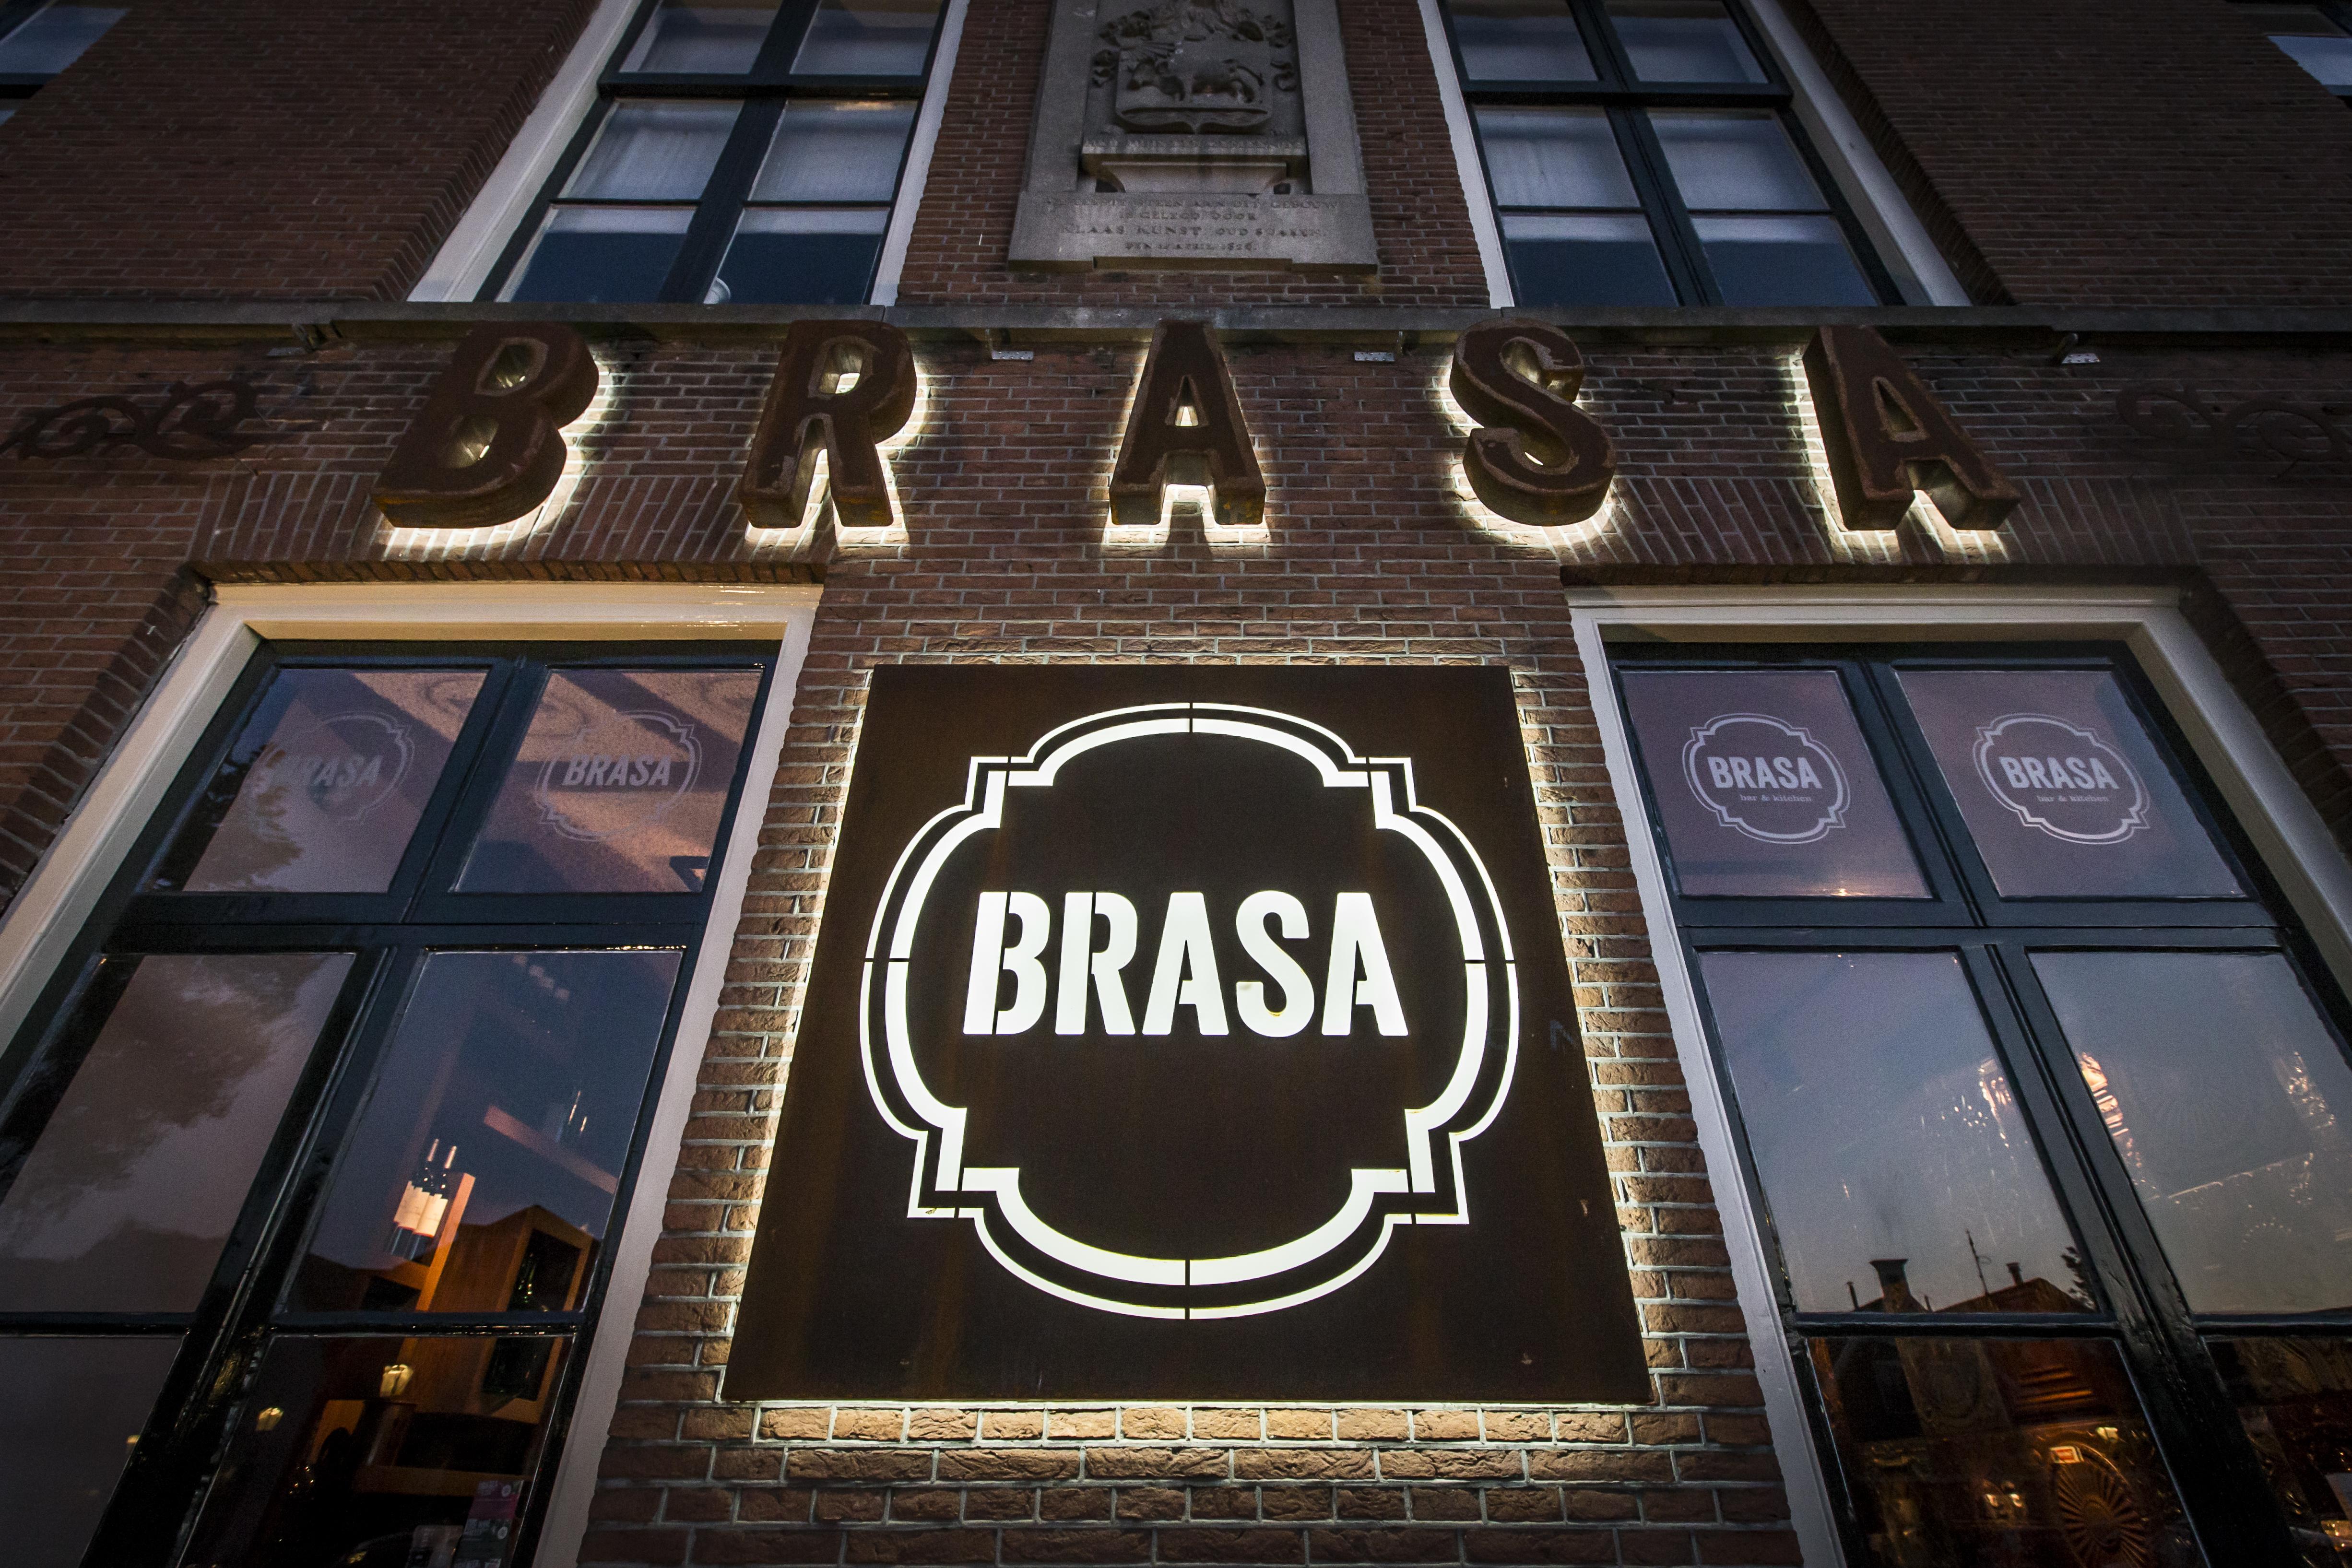 restaurant brasa beemster logo